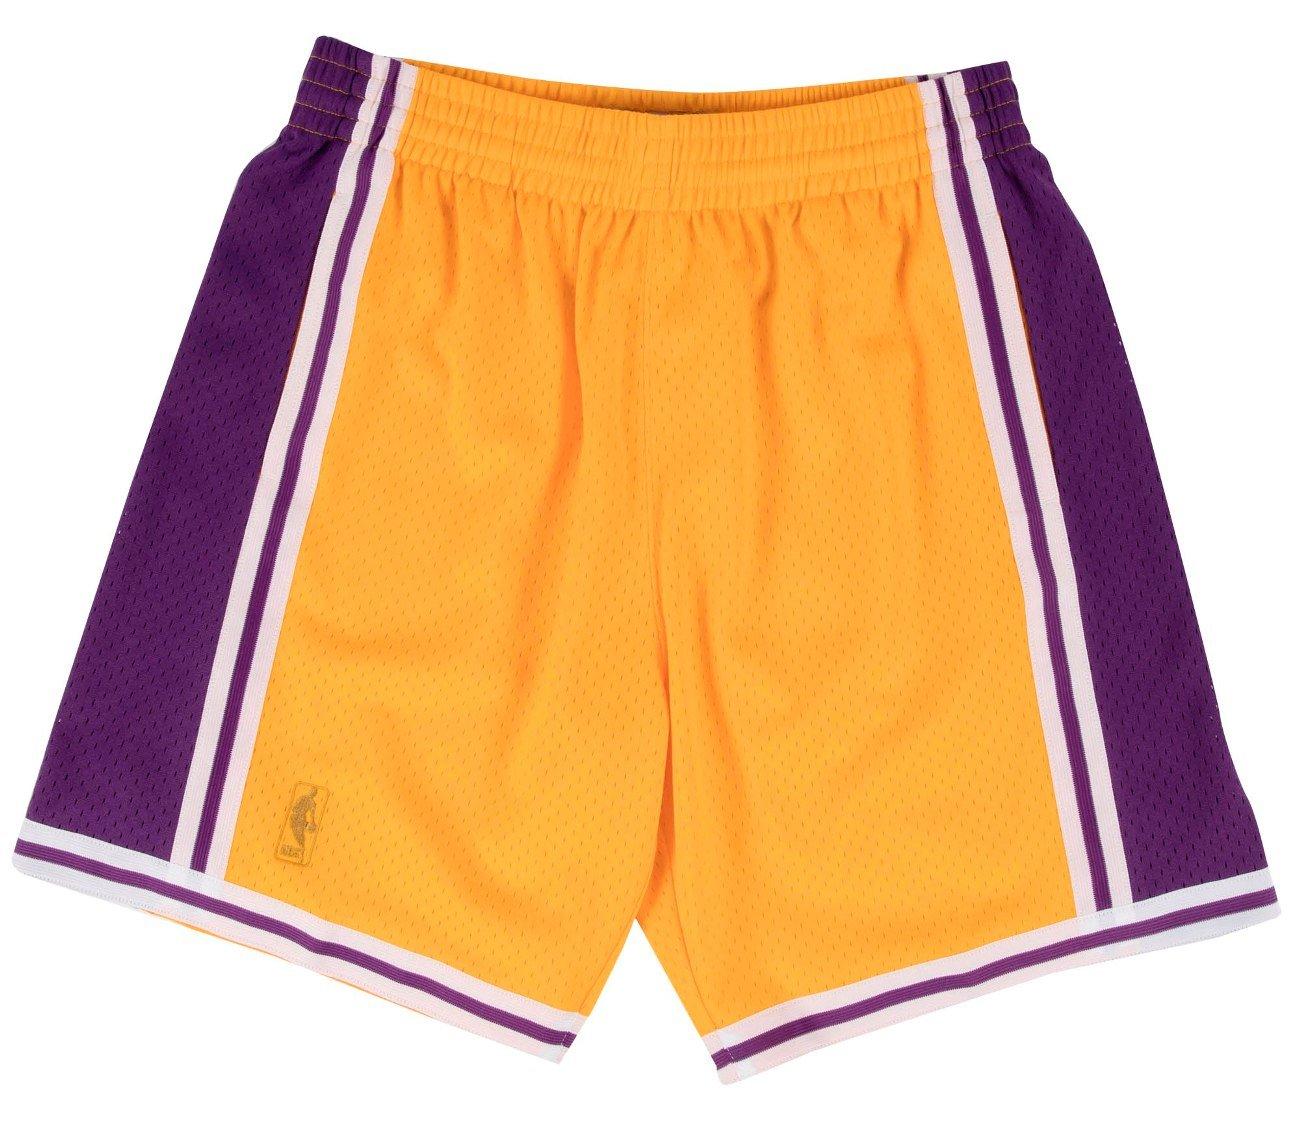 1f160351a15 Amazon.com   Mitchell   Ness Los Angeles Lakers NBA Swingman Men s Mesh  Shorts - 1996 Home   Sports   Outdoors